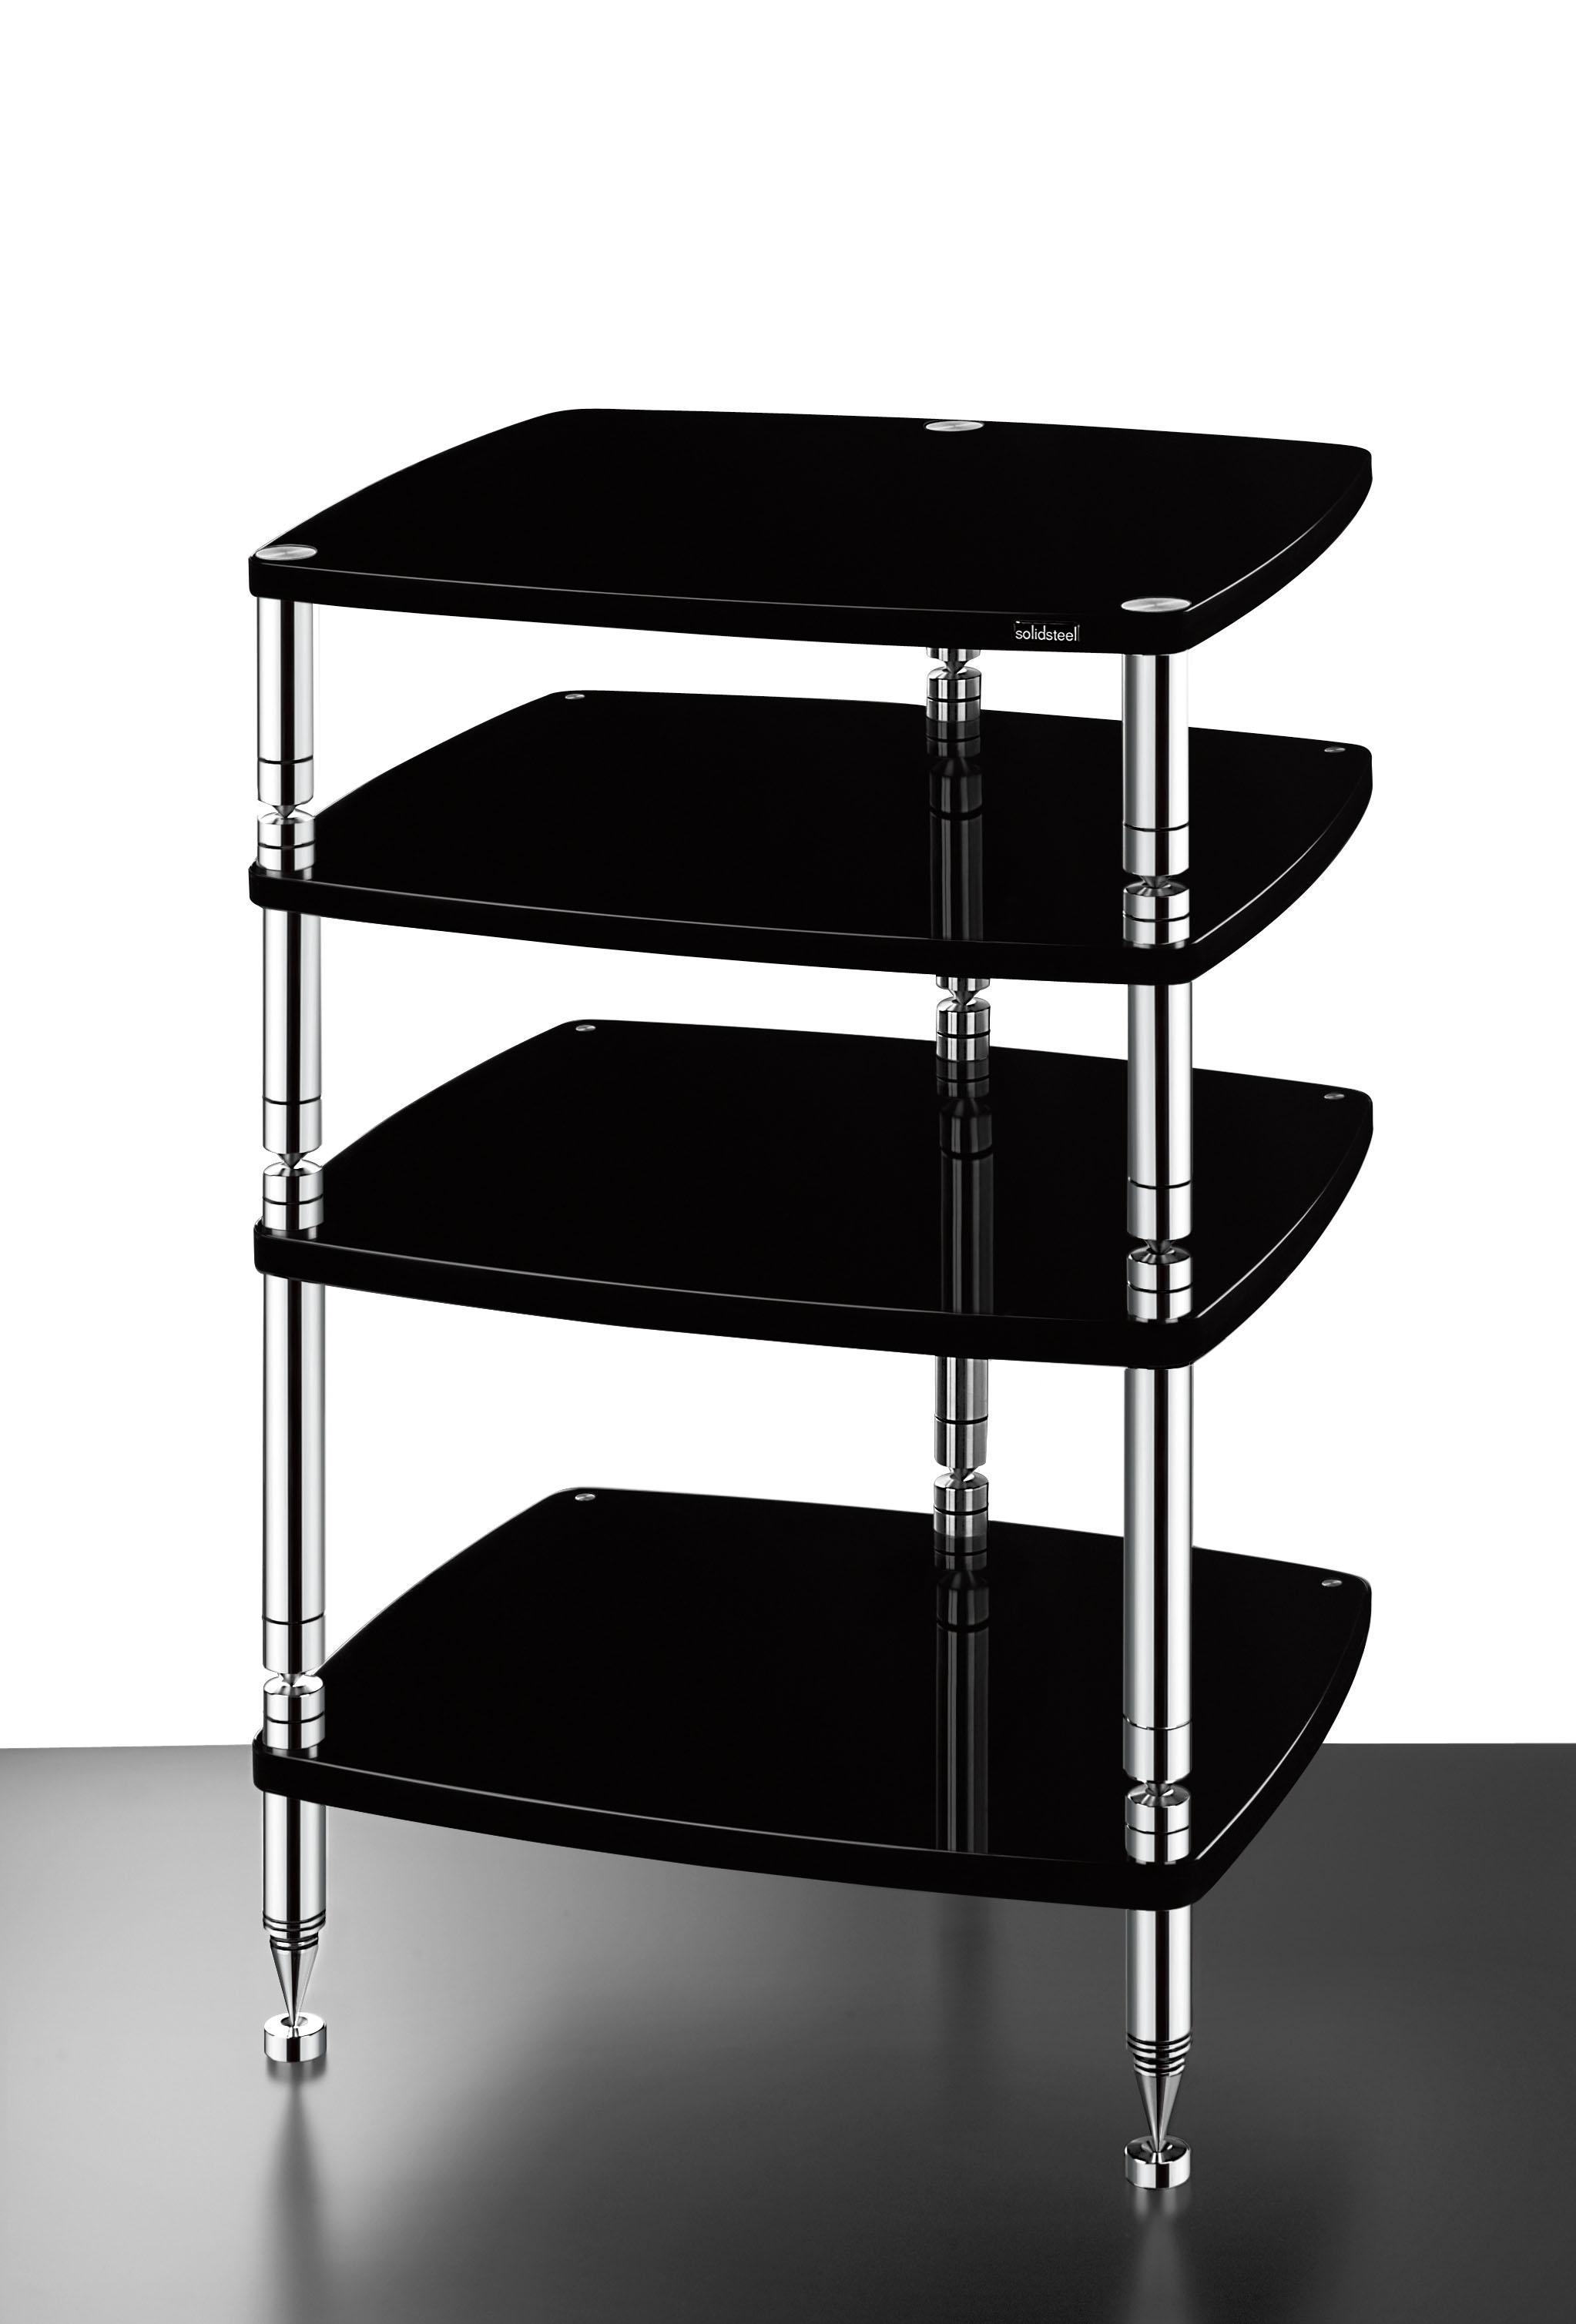 product solidsteel my end web audio fb rack high hj inch shelves shelf